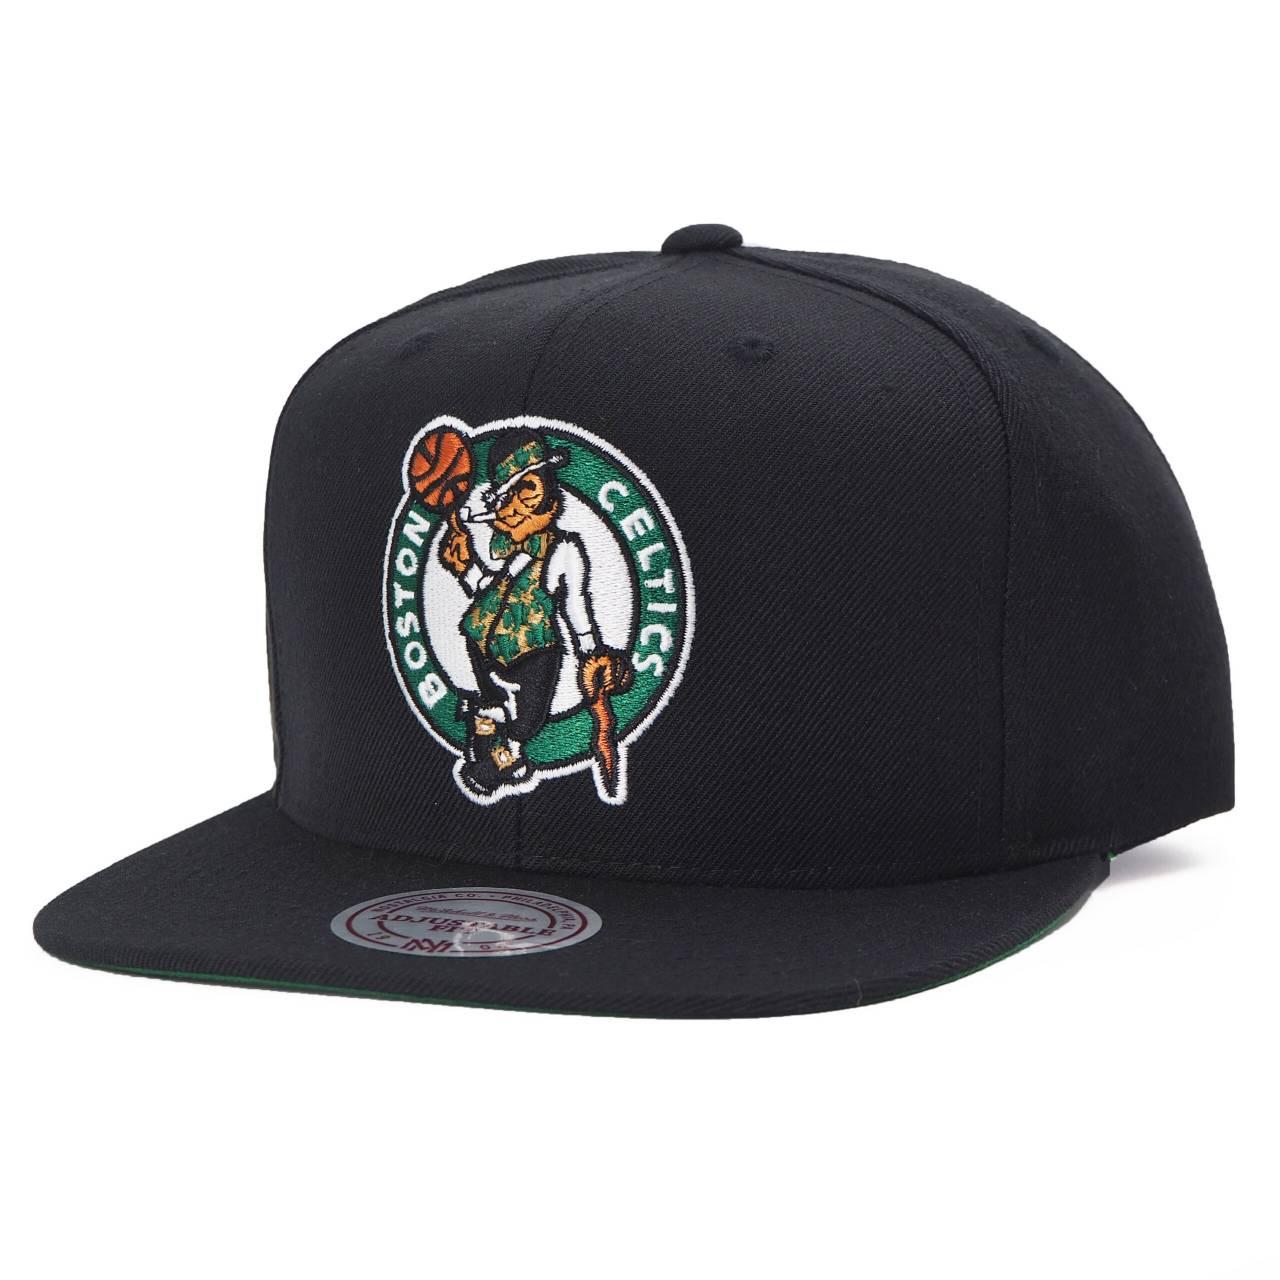 MN-NBA-INTL225-BOSCEL-BLK-OS NBA BOSTON CELTICS WOOL SOLID SNAPBACK BLACK